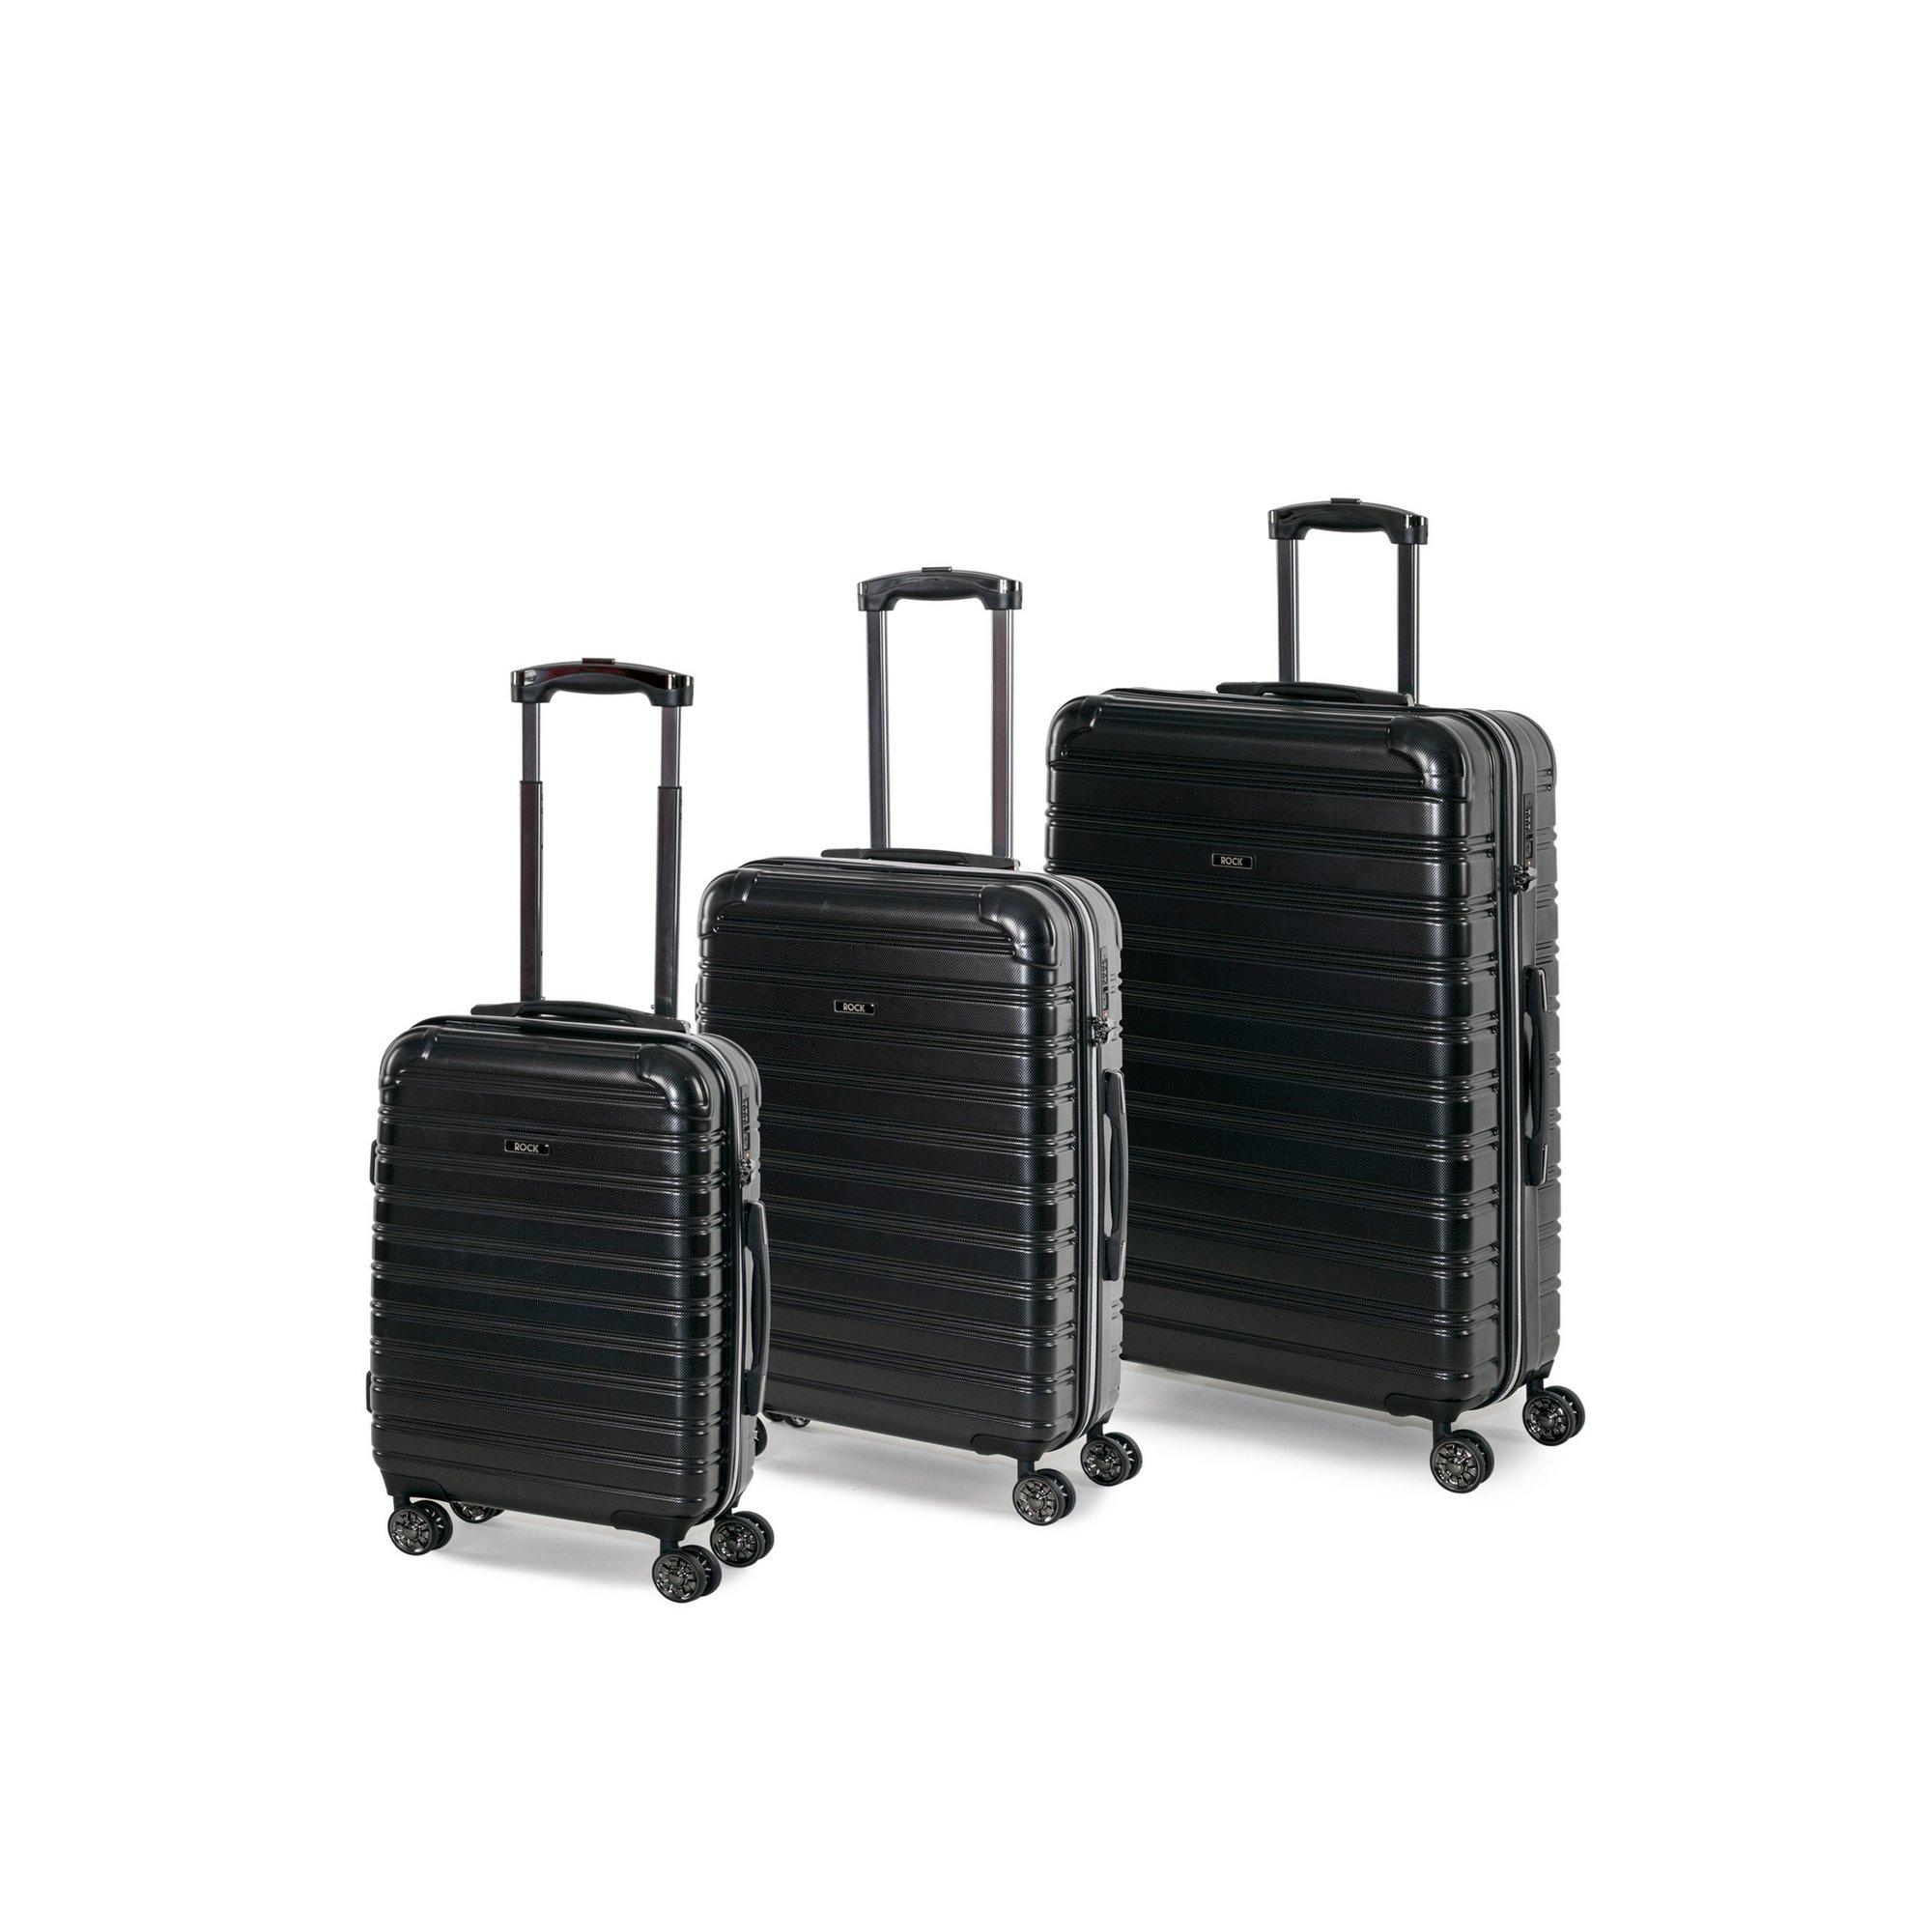 Image of Rock Chicago 3-Piece Suitcase Set